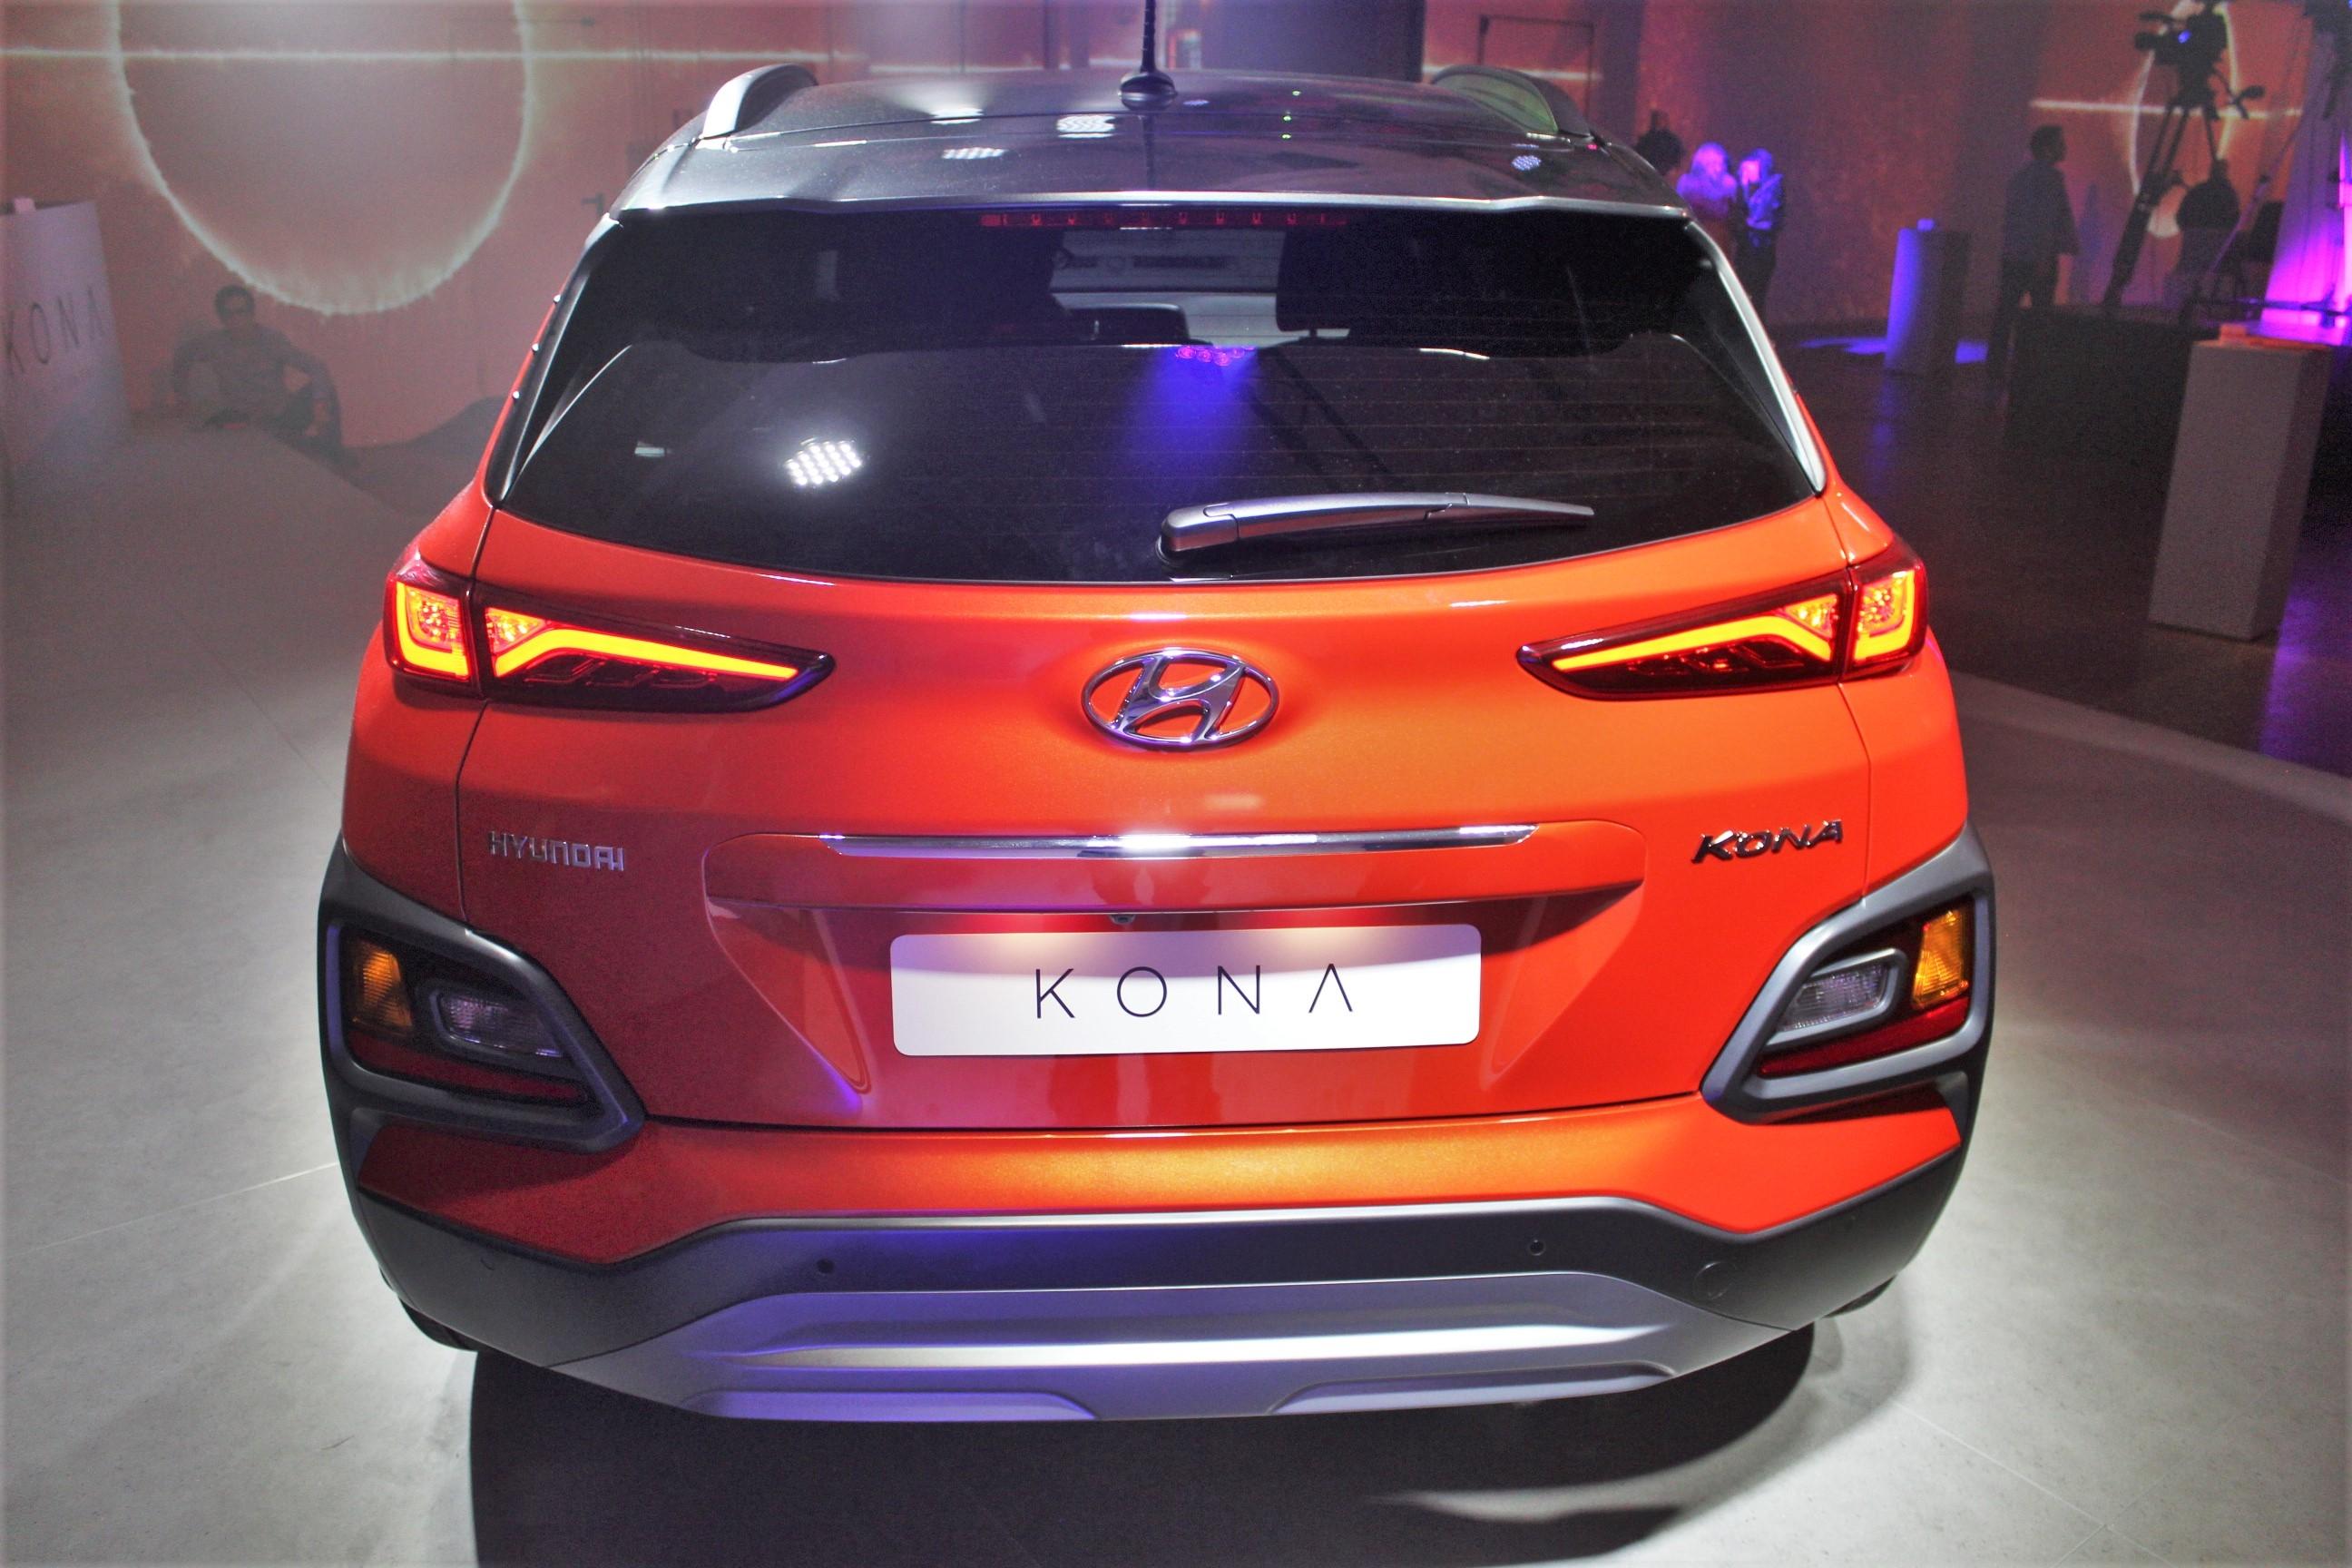 Hyundai Kona Fiche Technique >> Salon De Francfort 2017 Hyundai Kona Ose